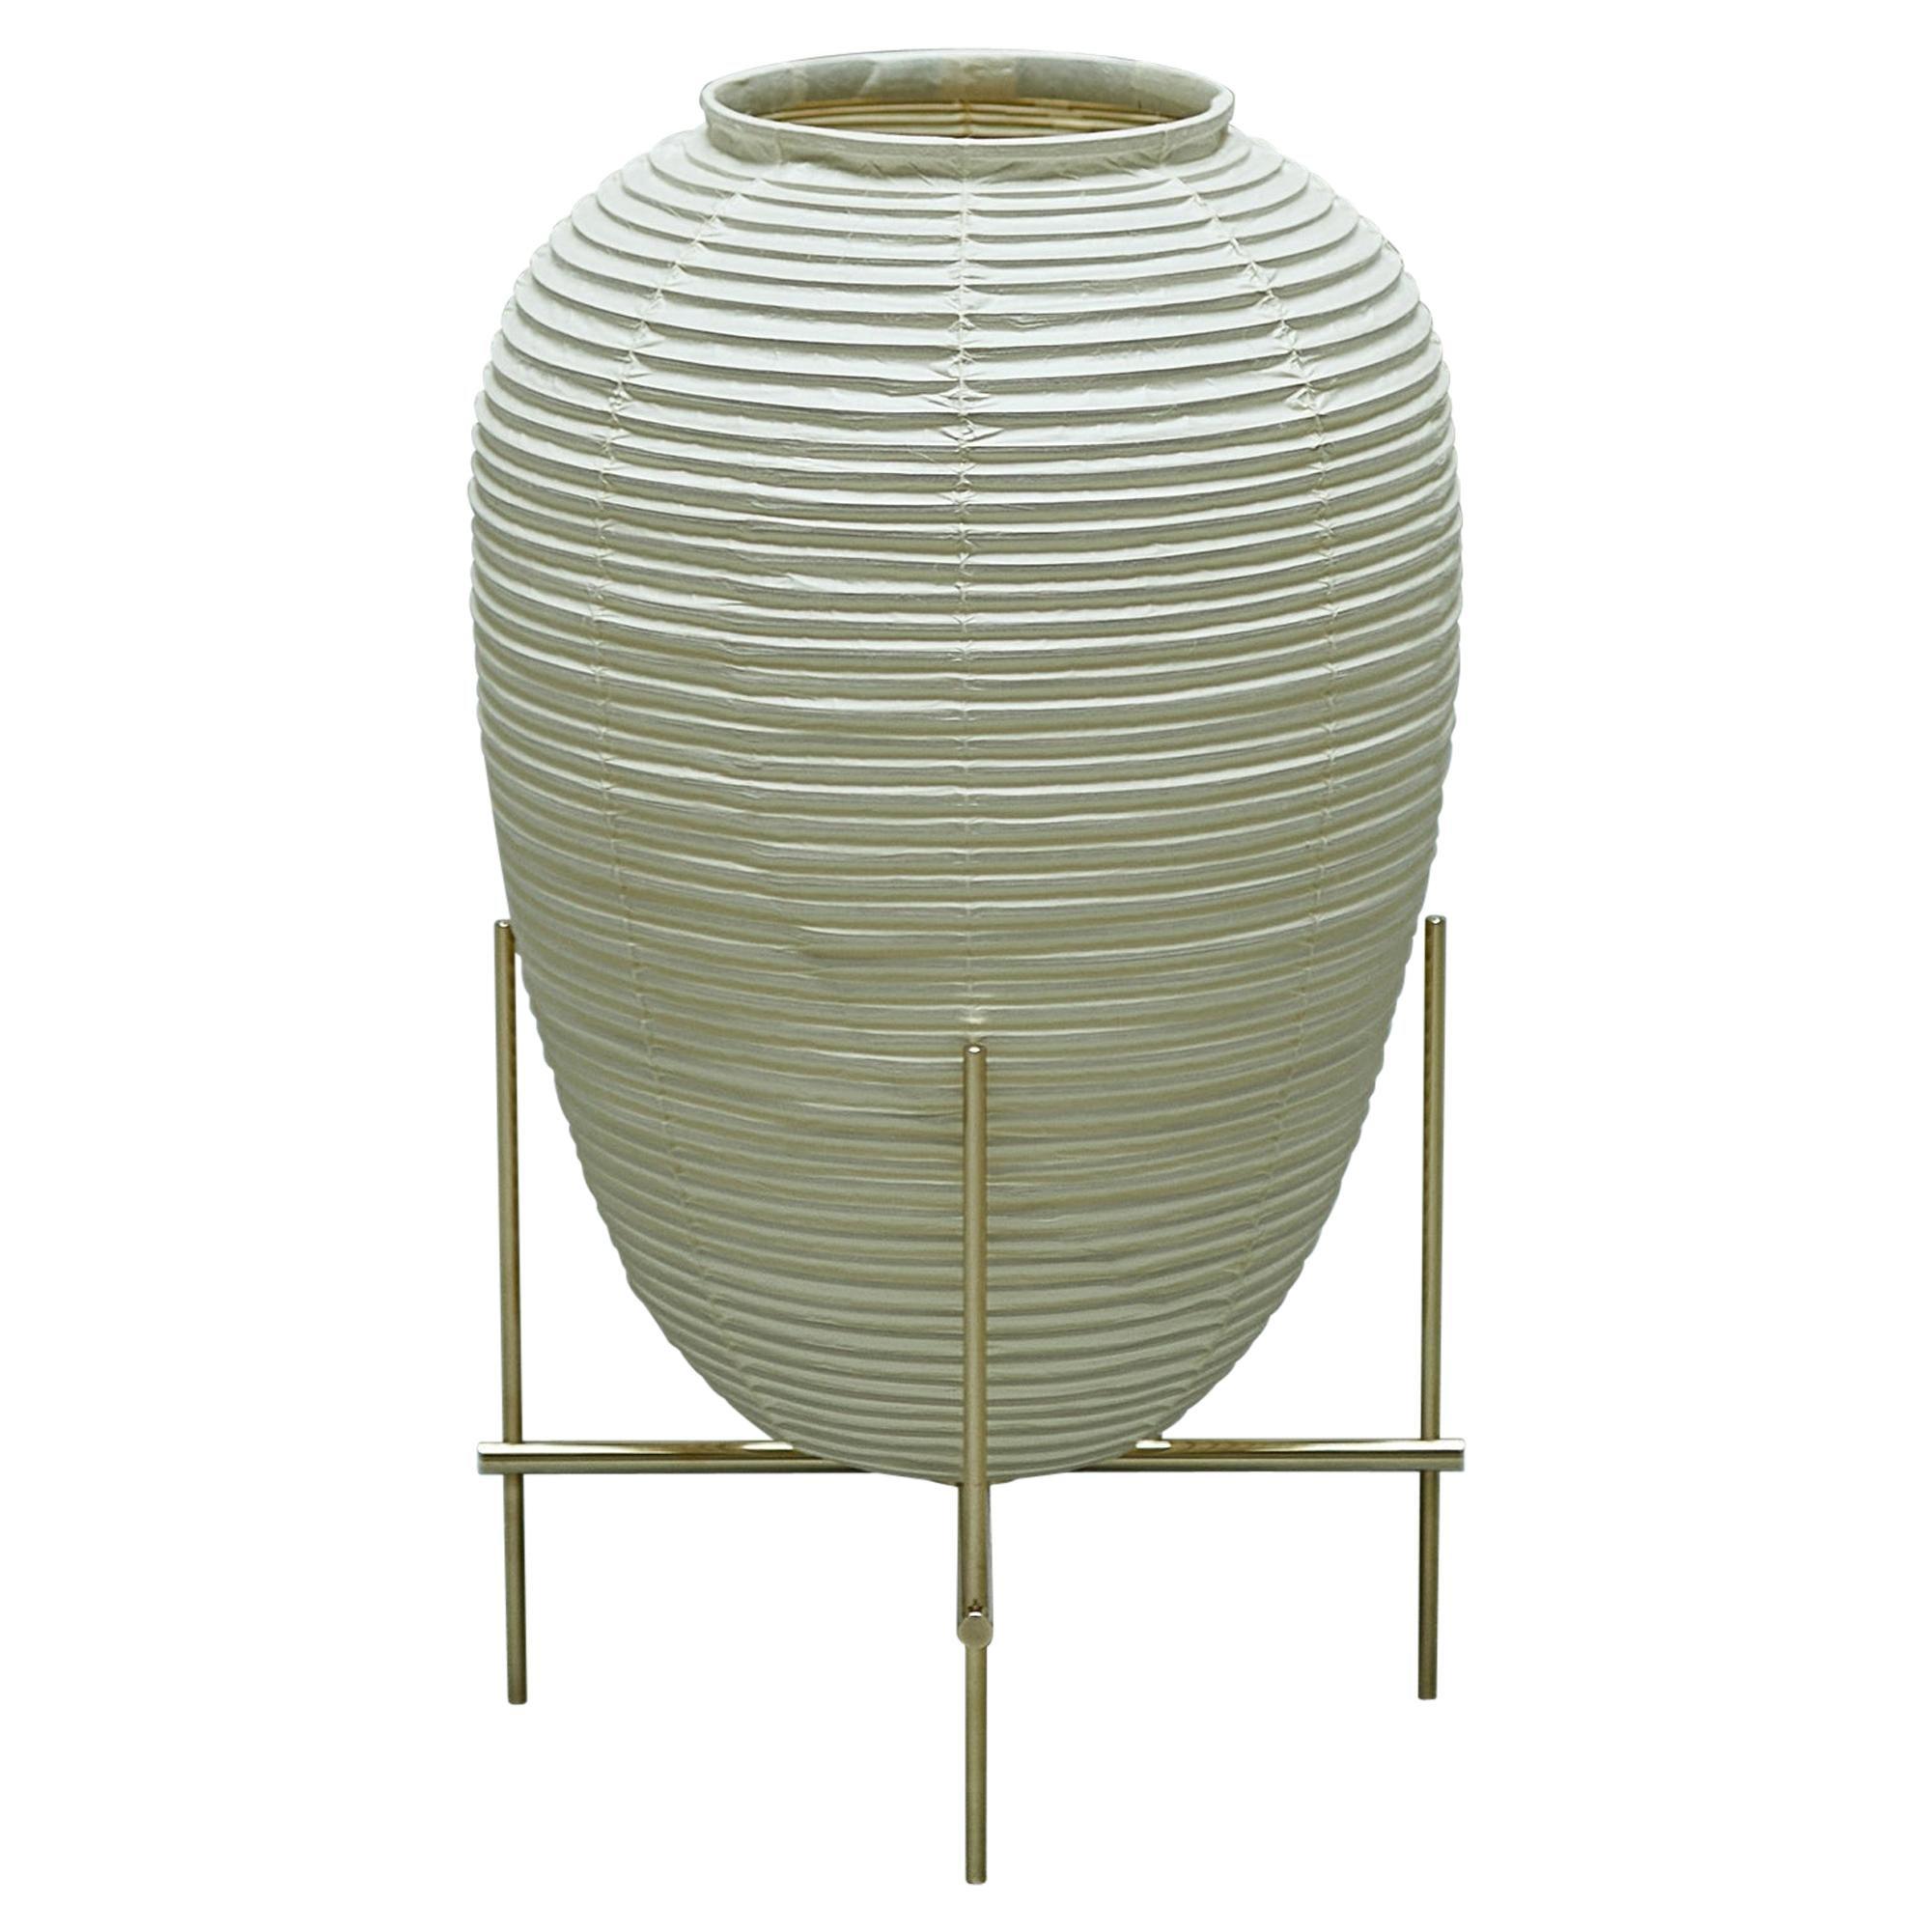 Contemporary Japanese Chochin Floor Lamp Zen Washi Japanese Paper Shade